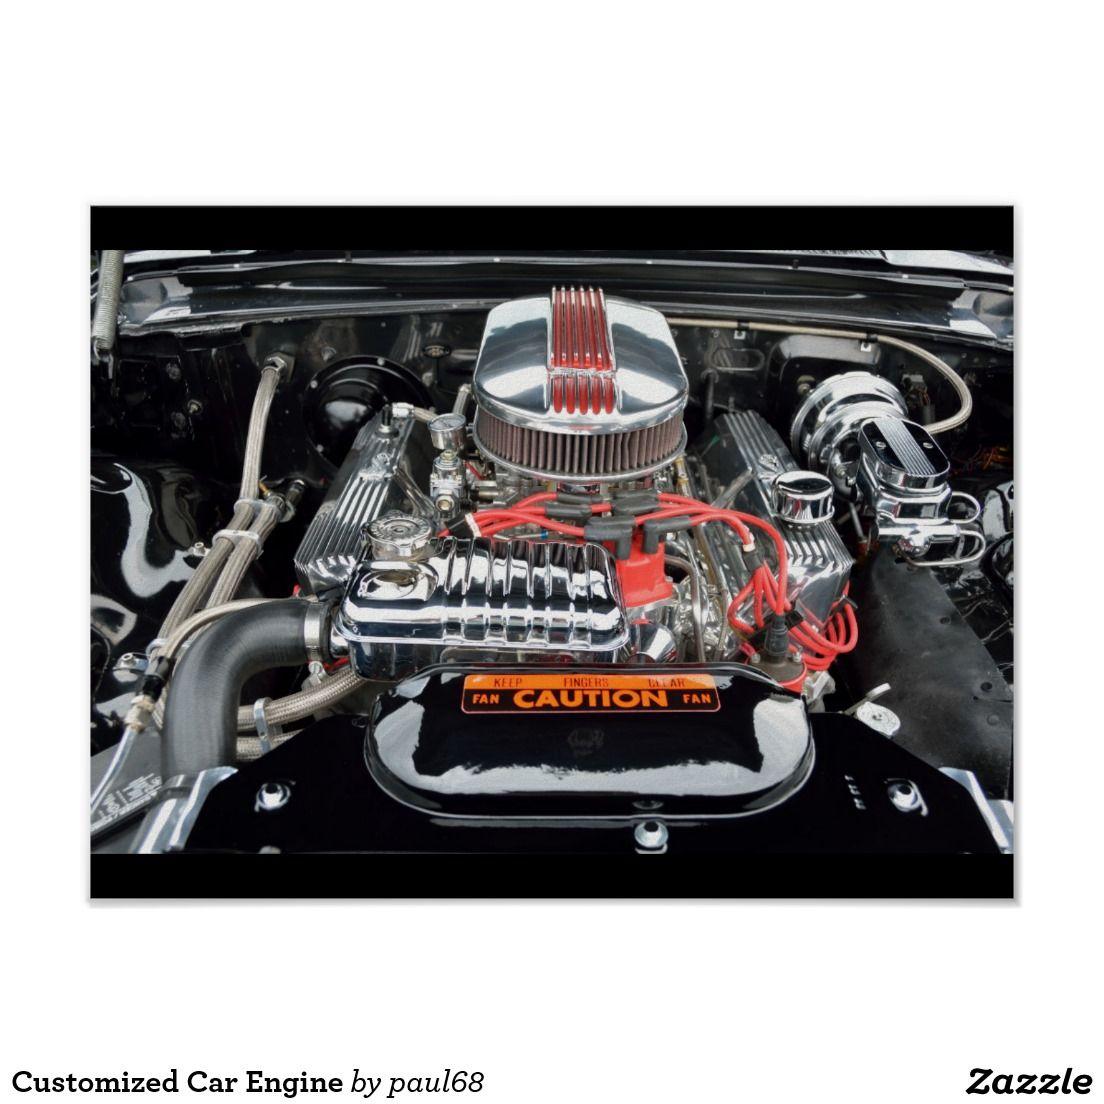 Customized Car Engine Poster Дизельный